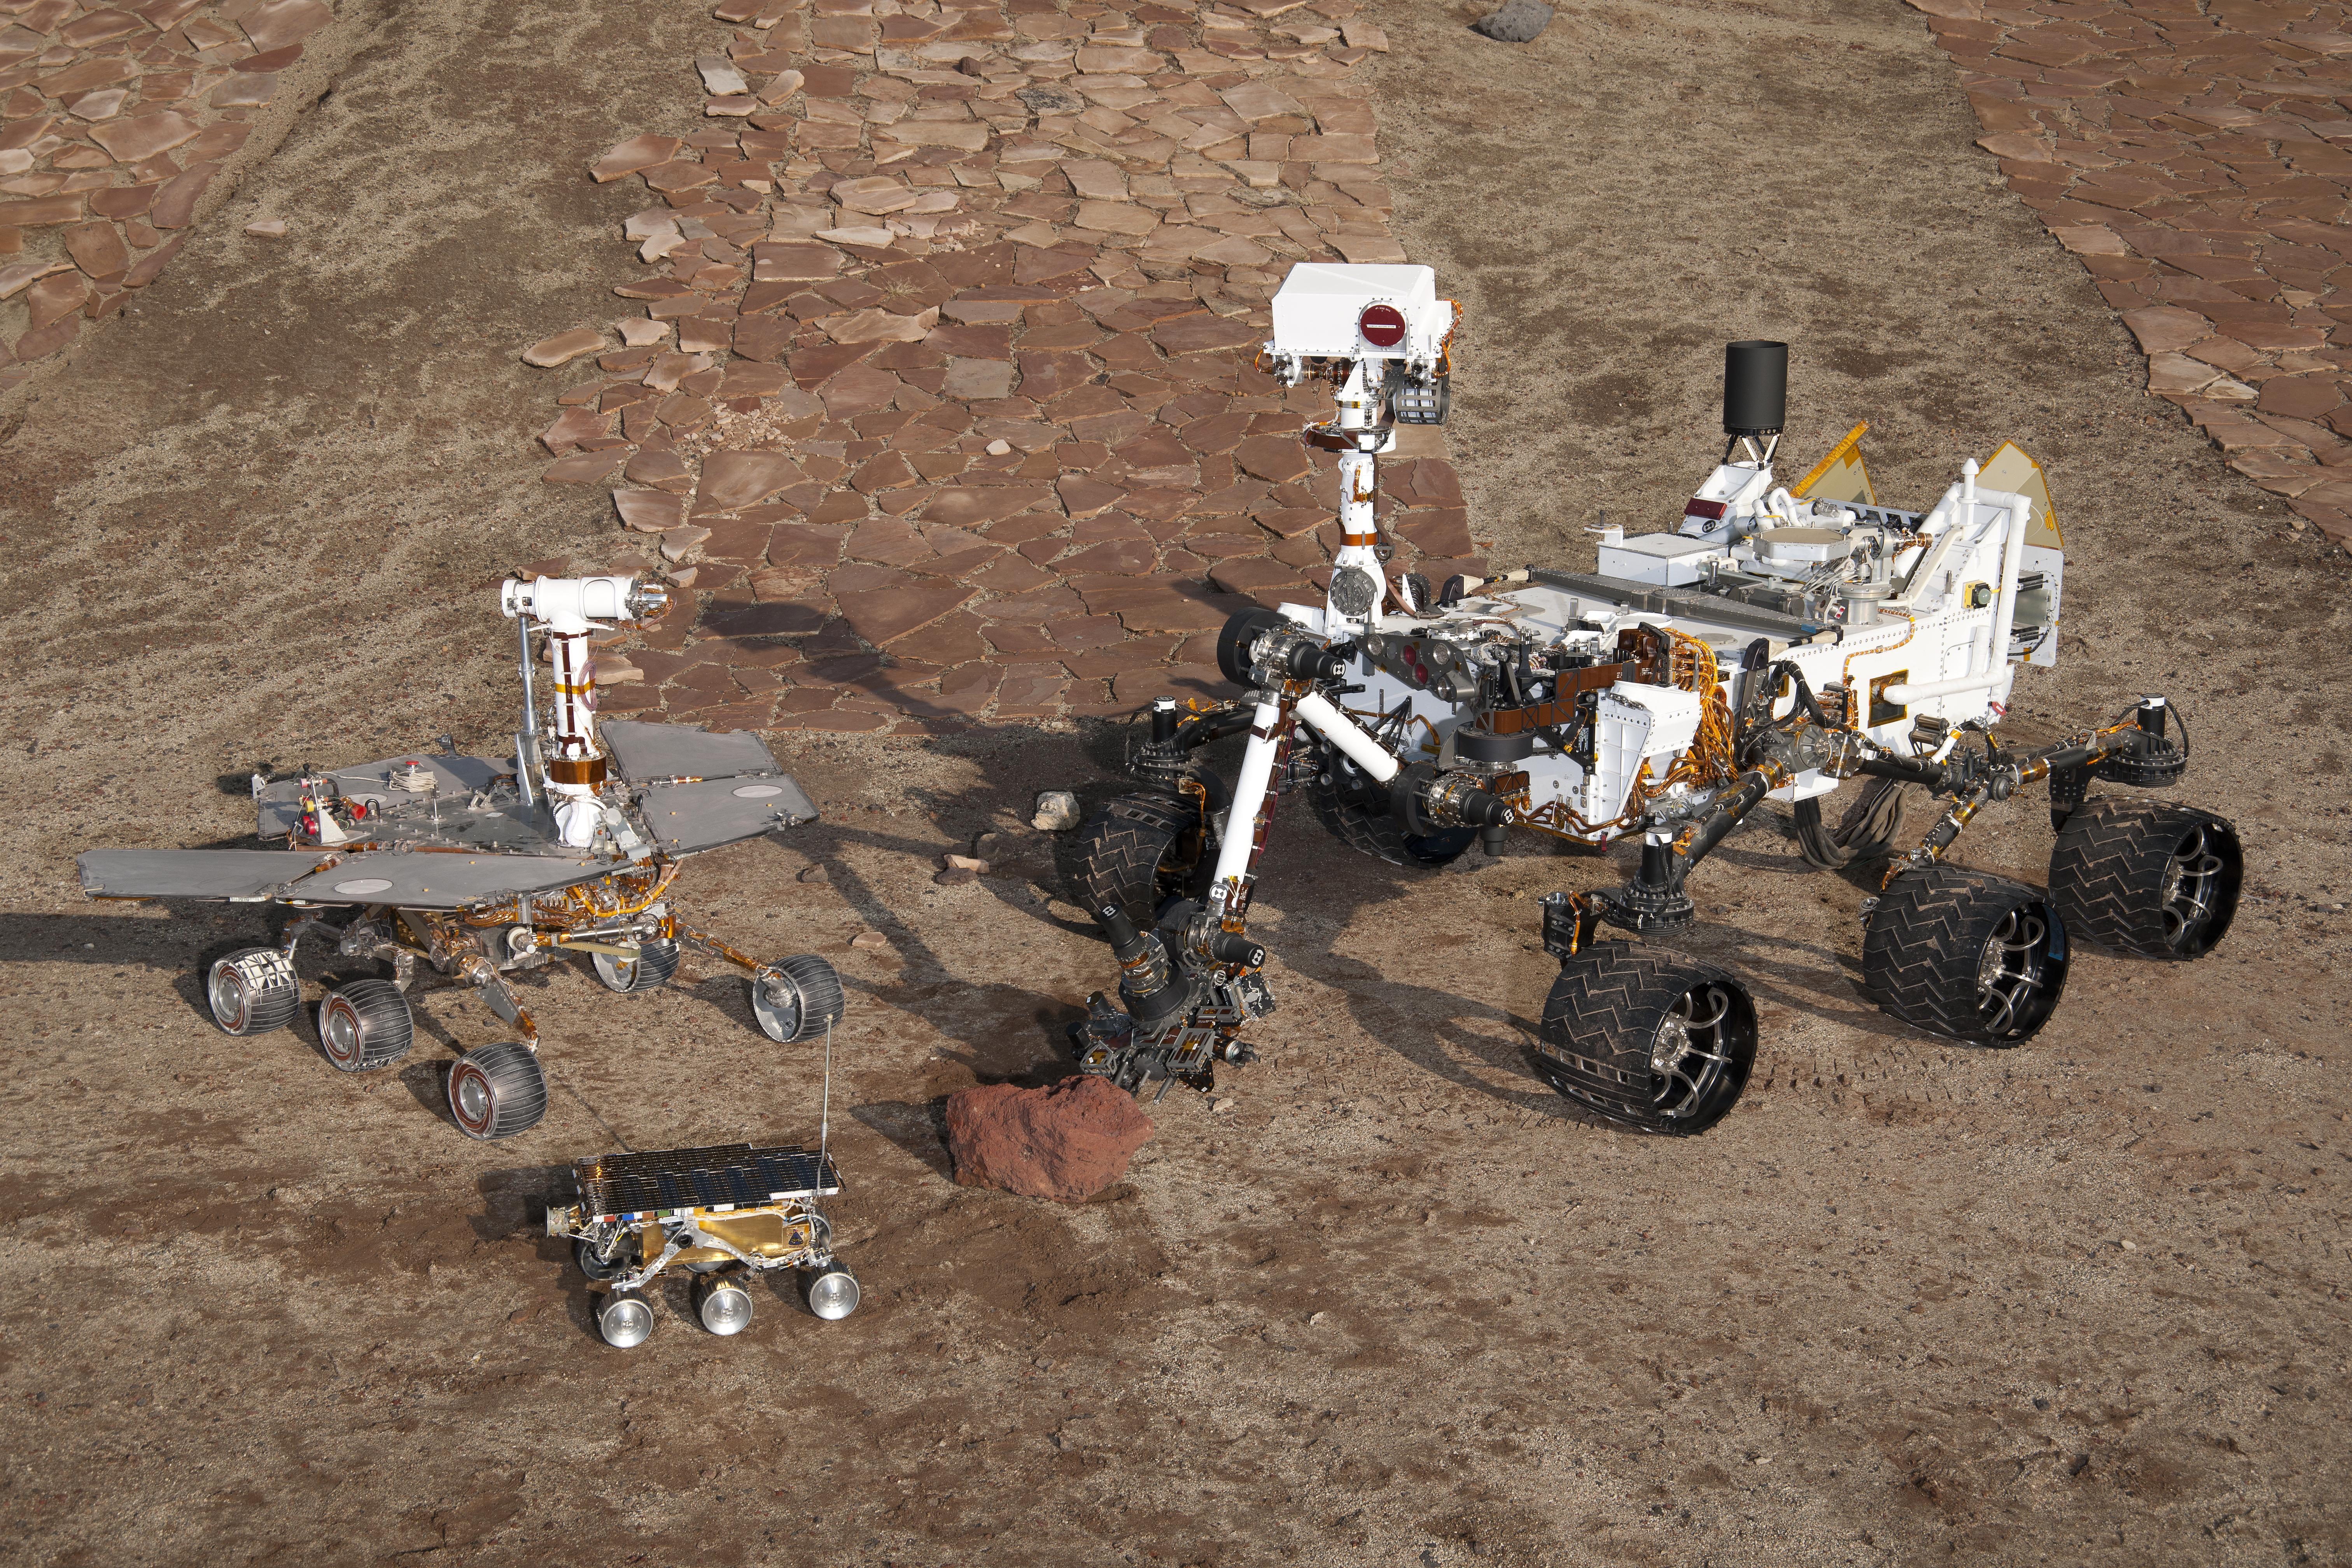 nasa explorer mars - HD1240×827